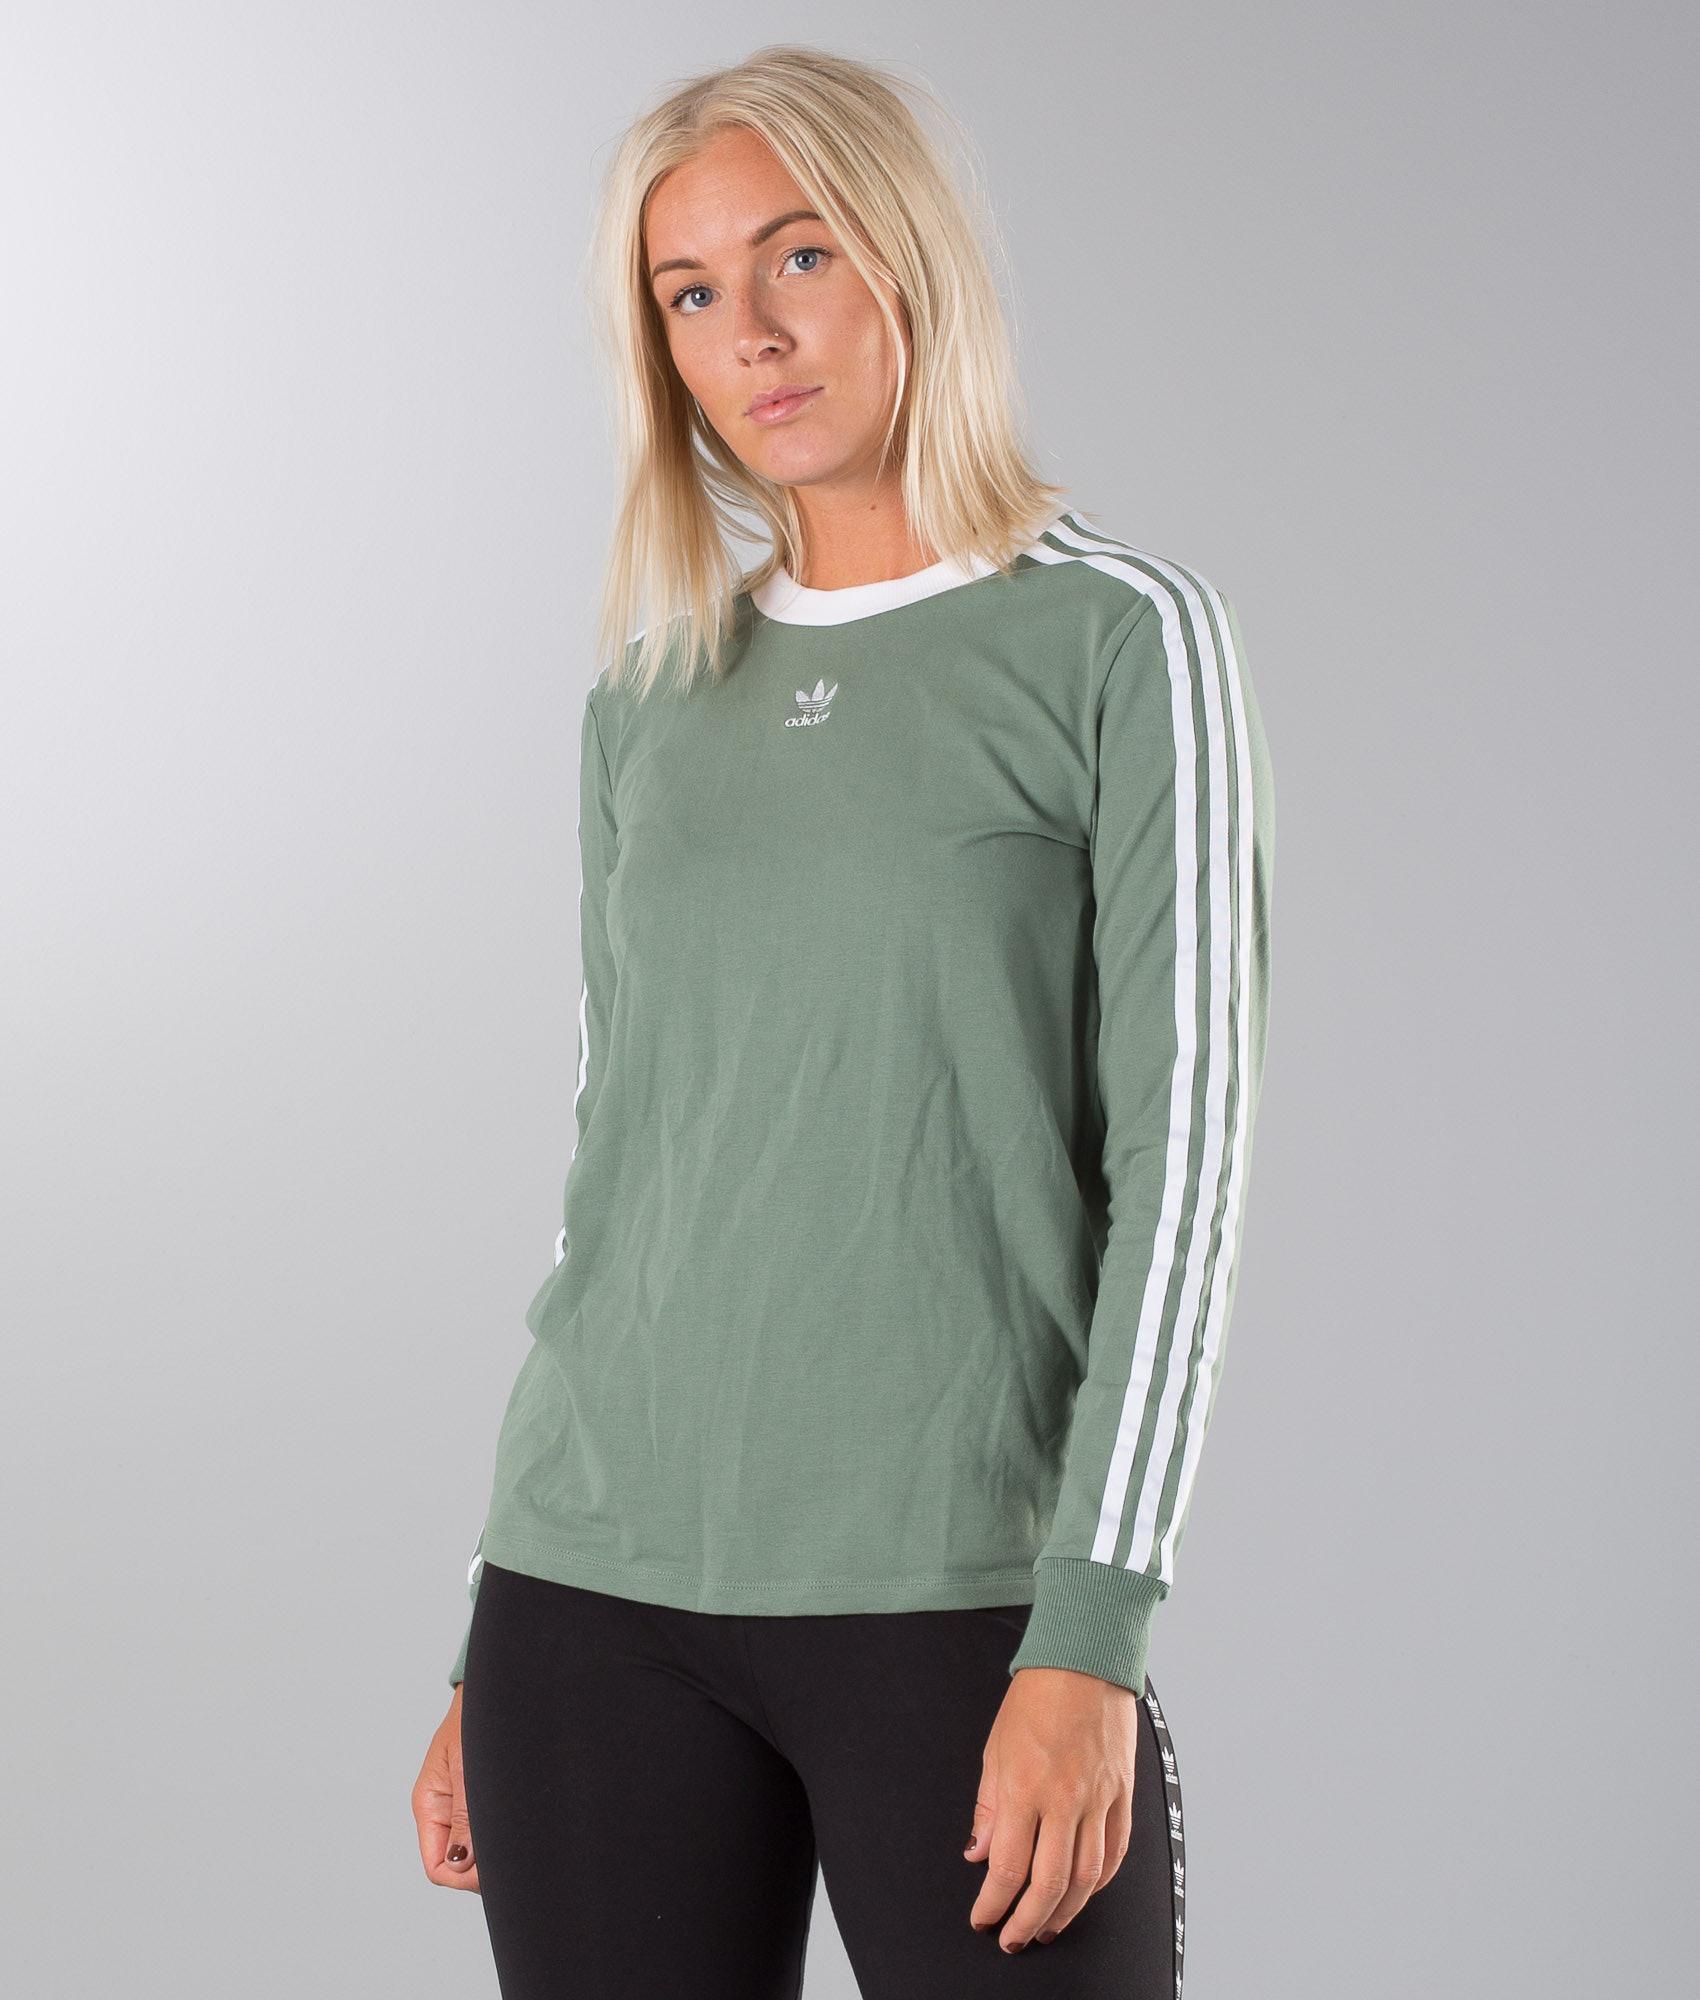 34b5fd3220 Adidas Originals 3 Stripes Longsleeve Trace Green - Ridestore.com